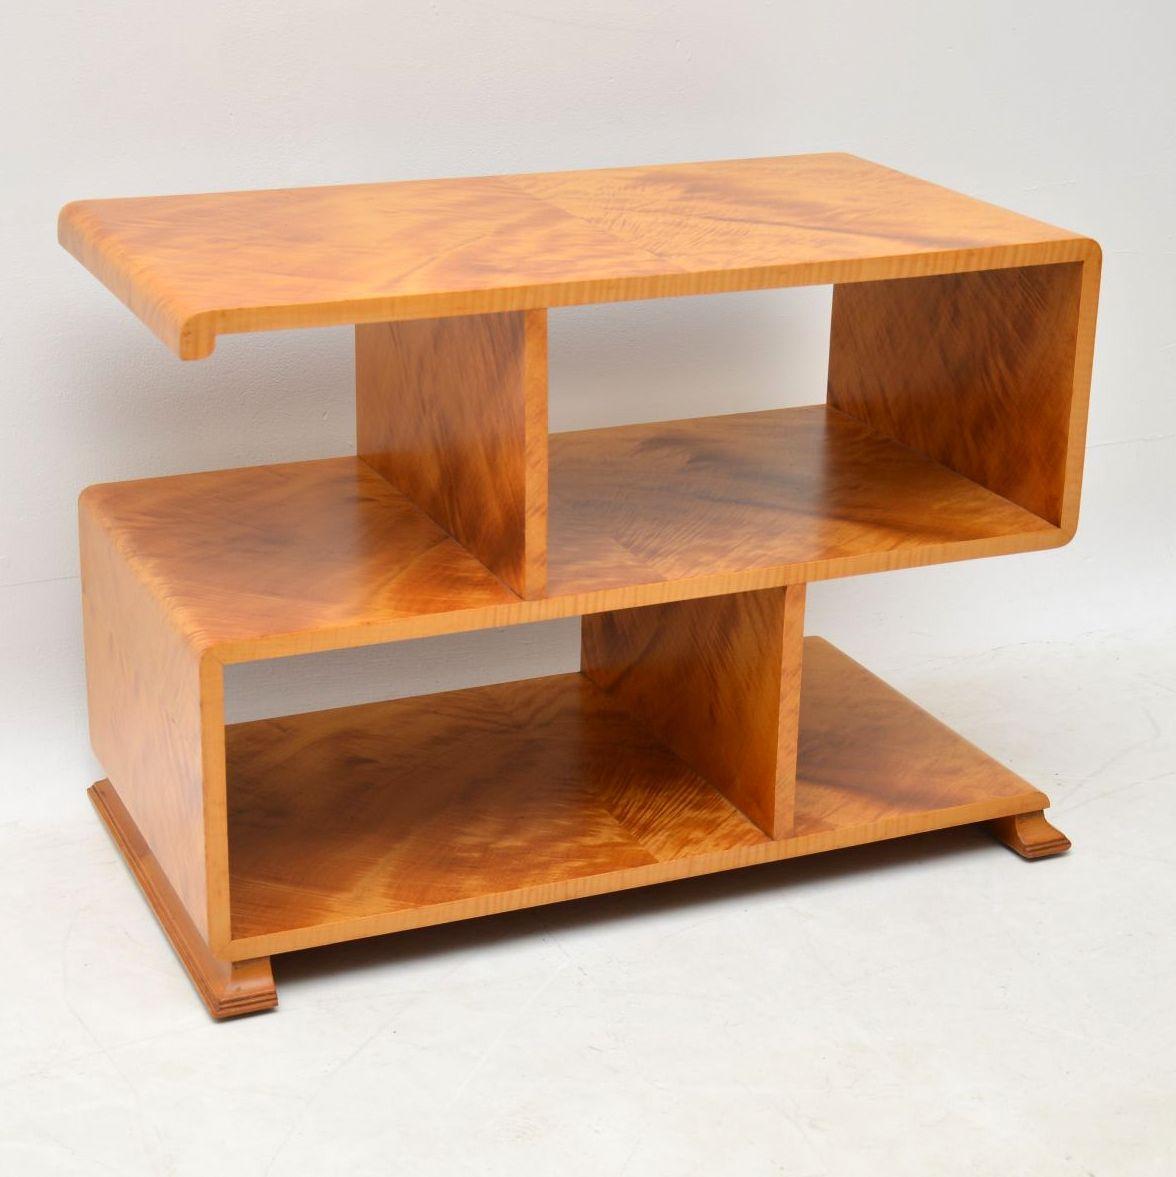 art_deco_antique_vintage_satin_wood_side_table_9